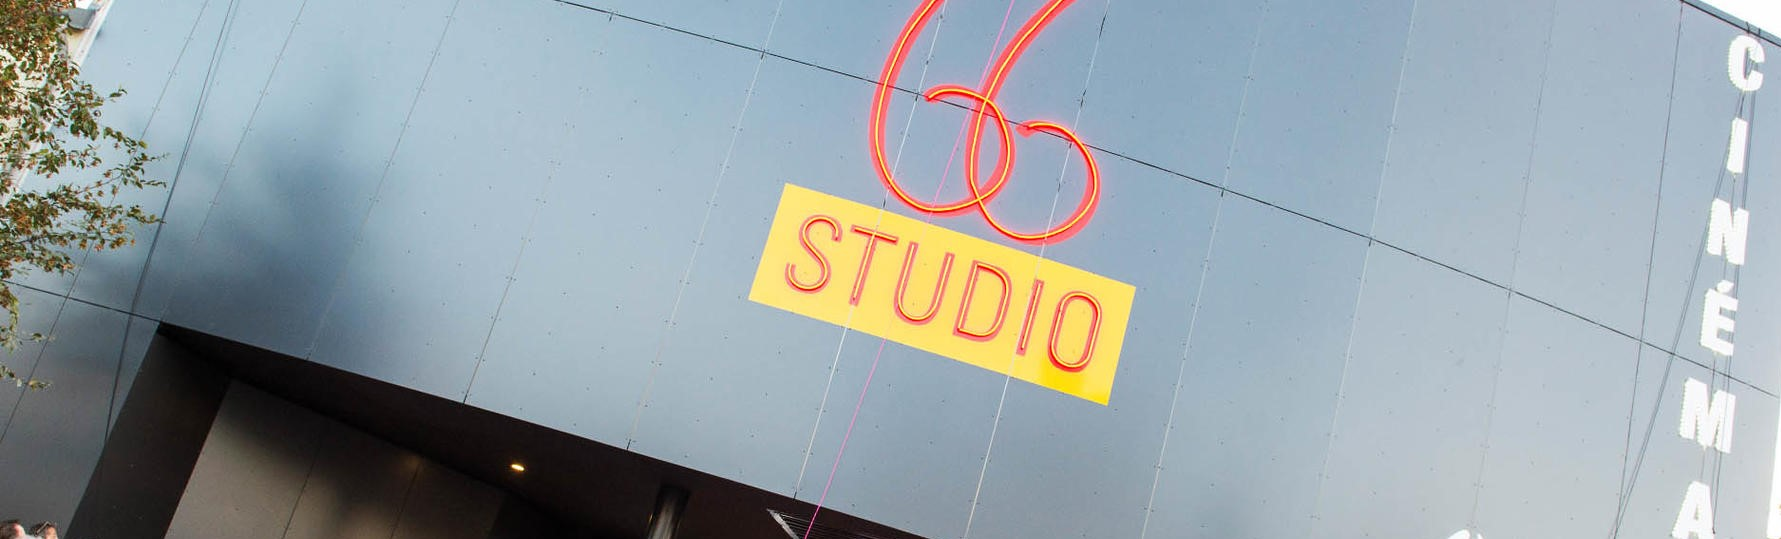 Image Studio 66